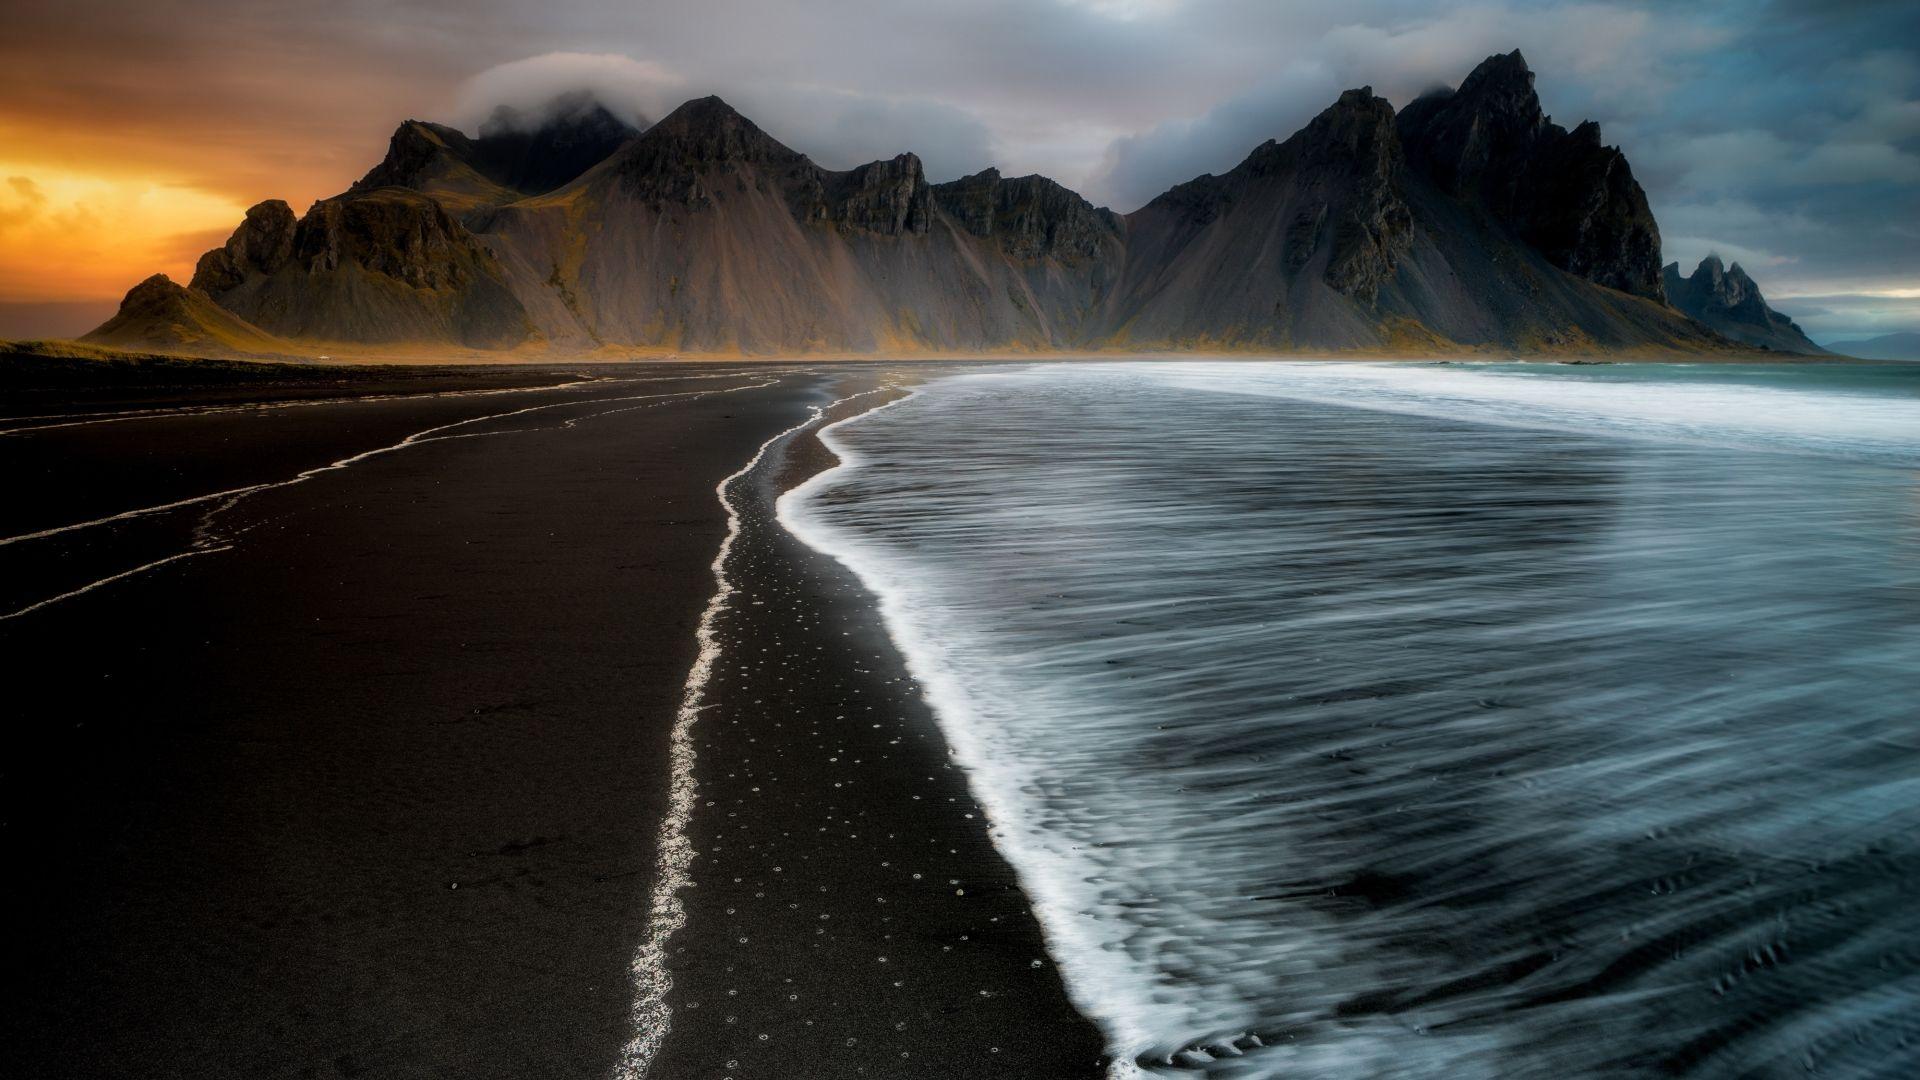 Iceland desktop wallpaper download